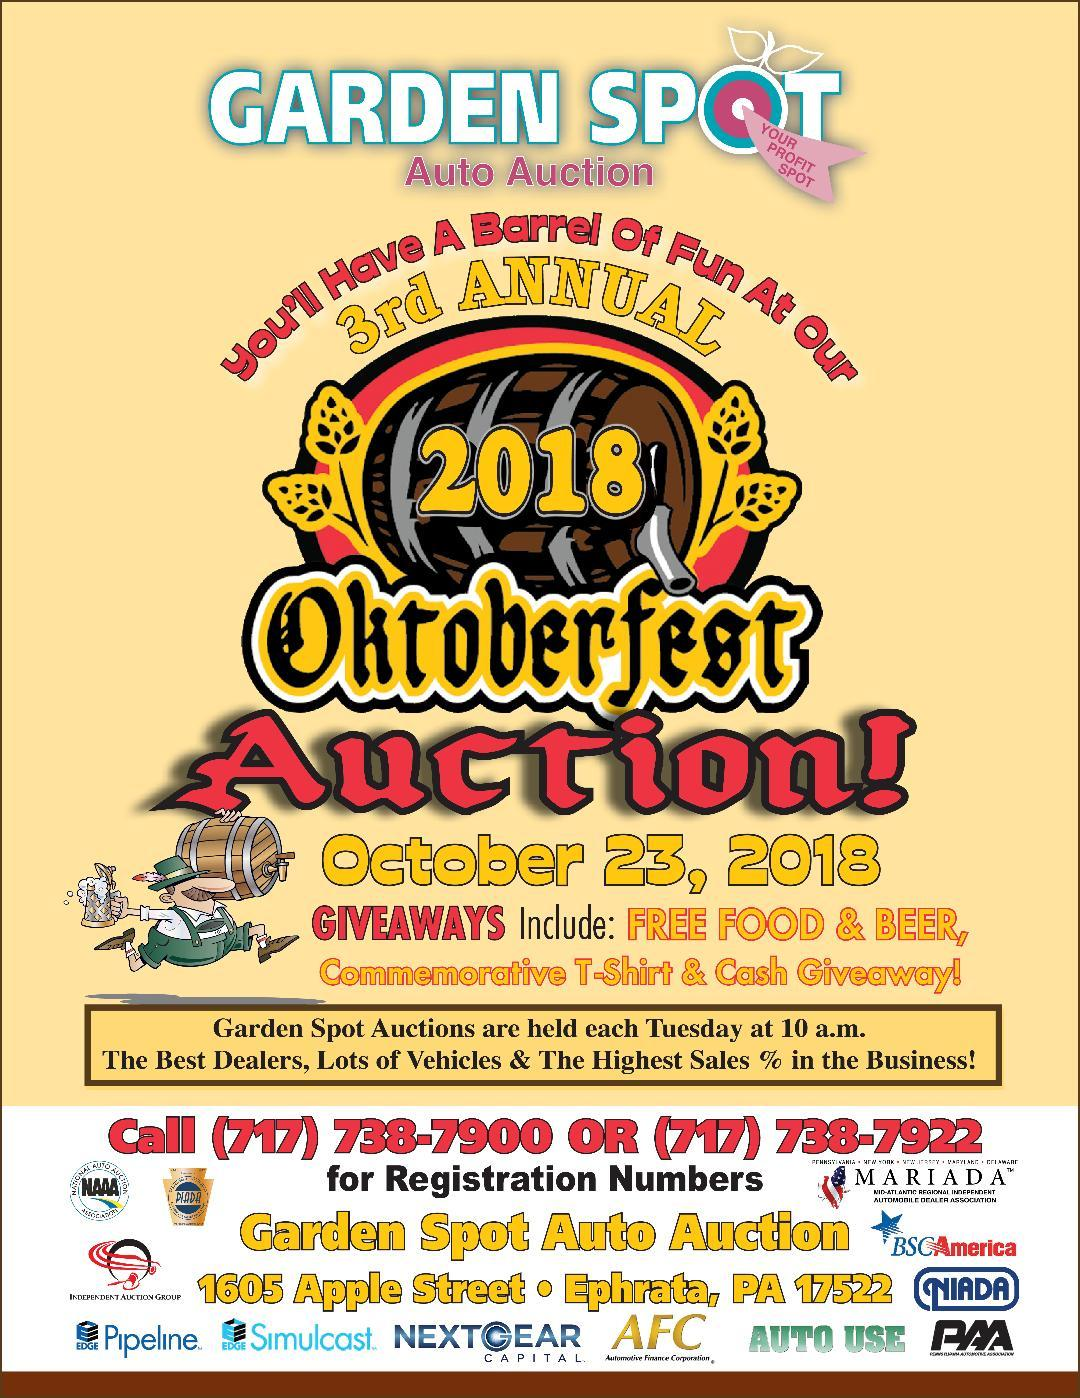 1023 3rd annual oktoberfest - Garden Spot Auto Auction